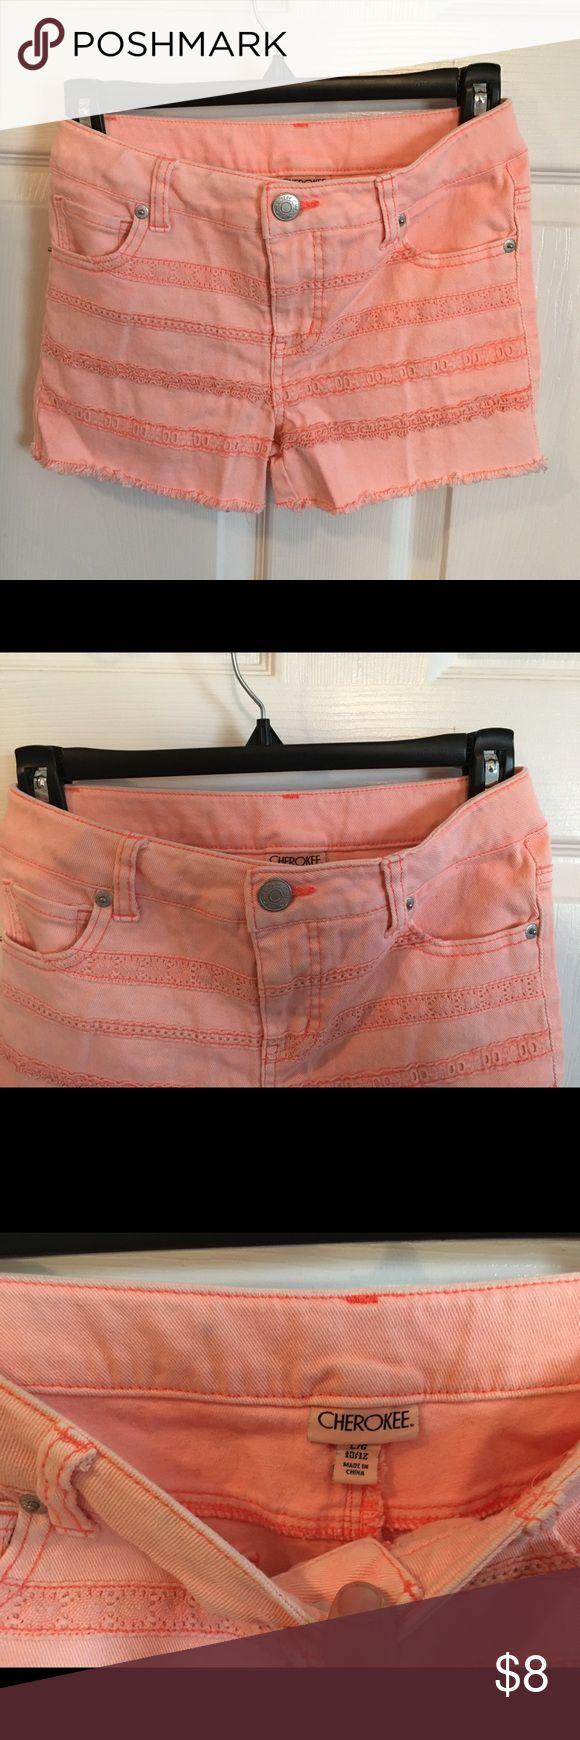 Cherokee Peach Jean Shorts Girls L 10/12 Great shape Peach color Size Large 10/12 Adjustable elastic Waistband Cherokee Bottoms Shorts